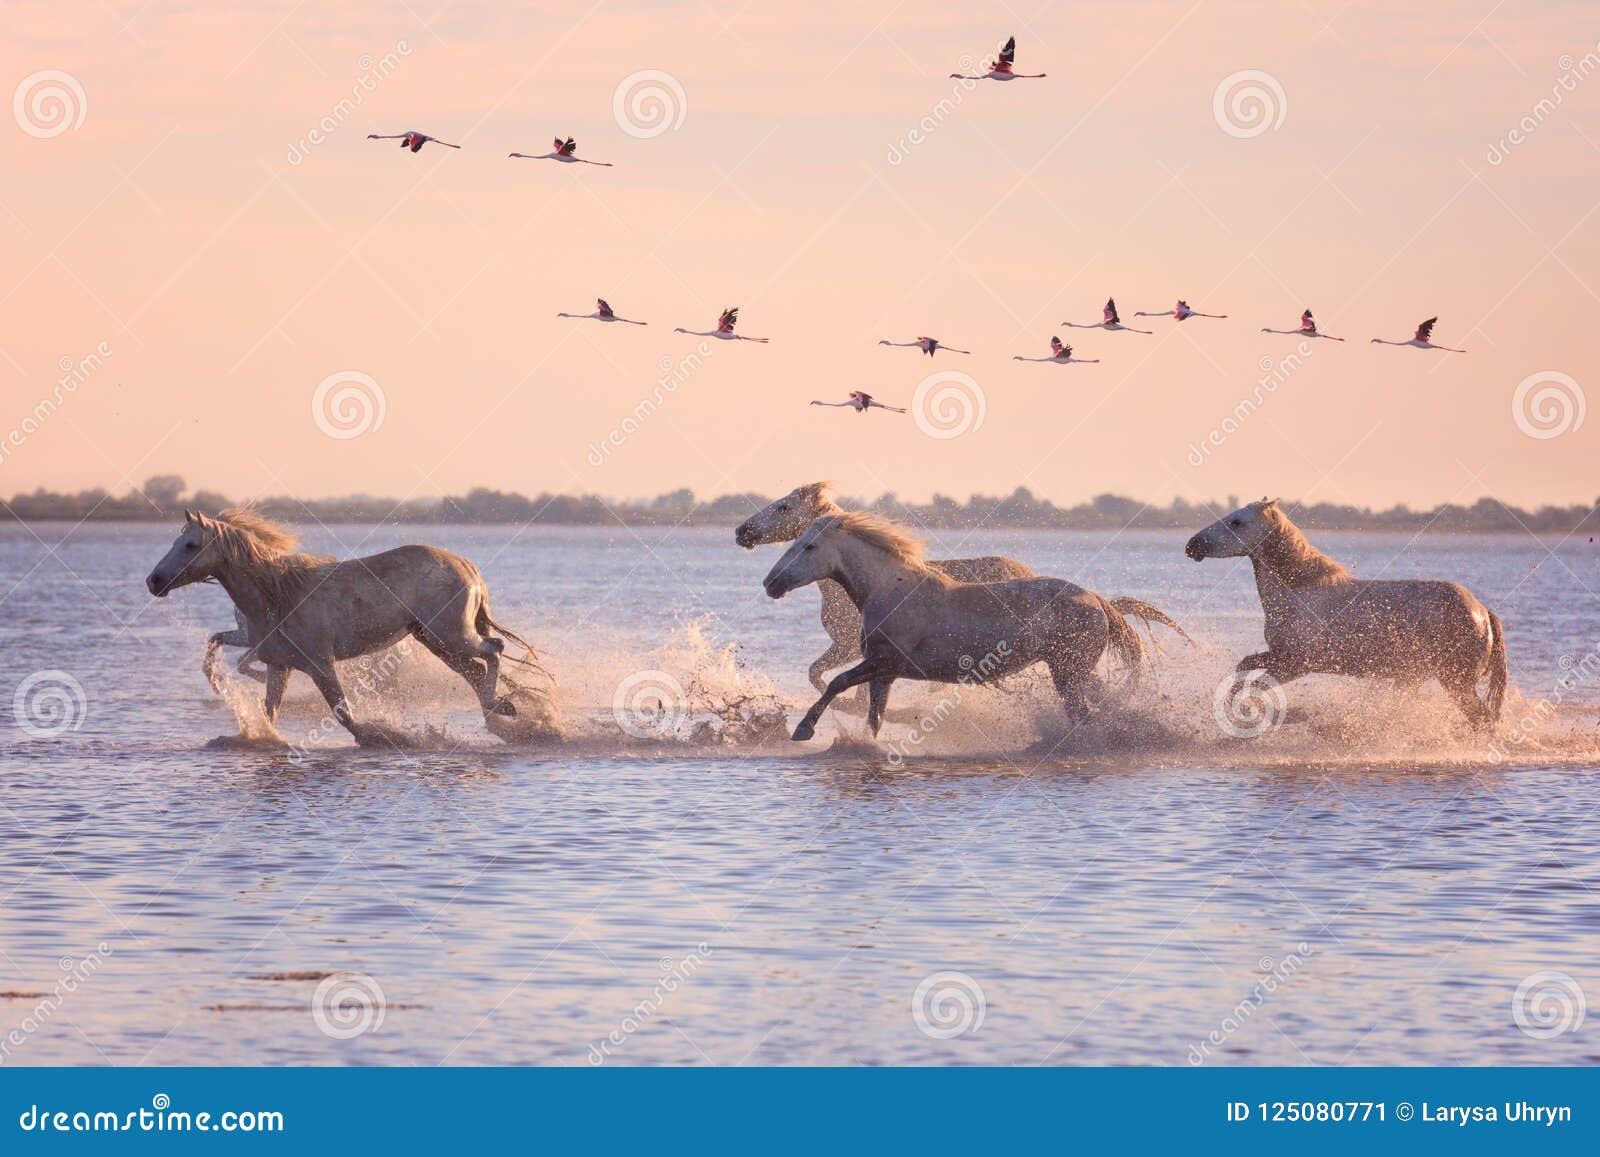 Галоп бега белых лошадей в воде на фоне фламинго на заходе солнца, Camargue летания, Франции